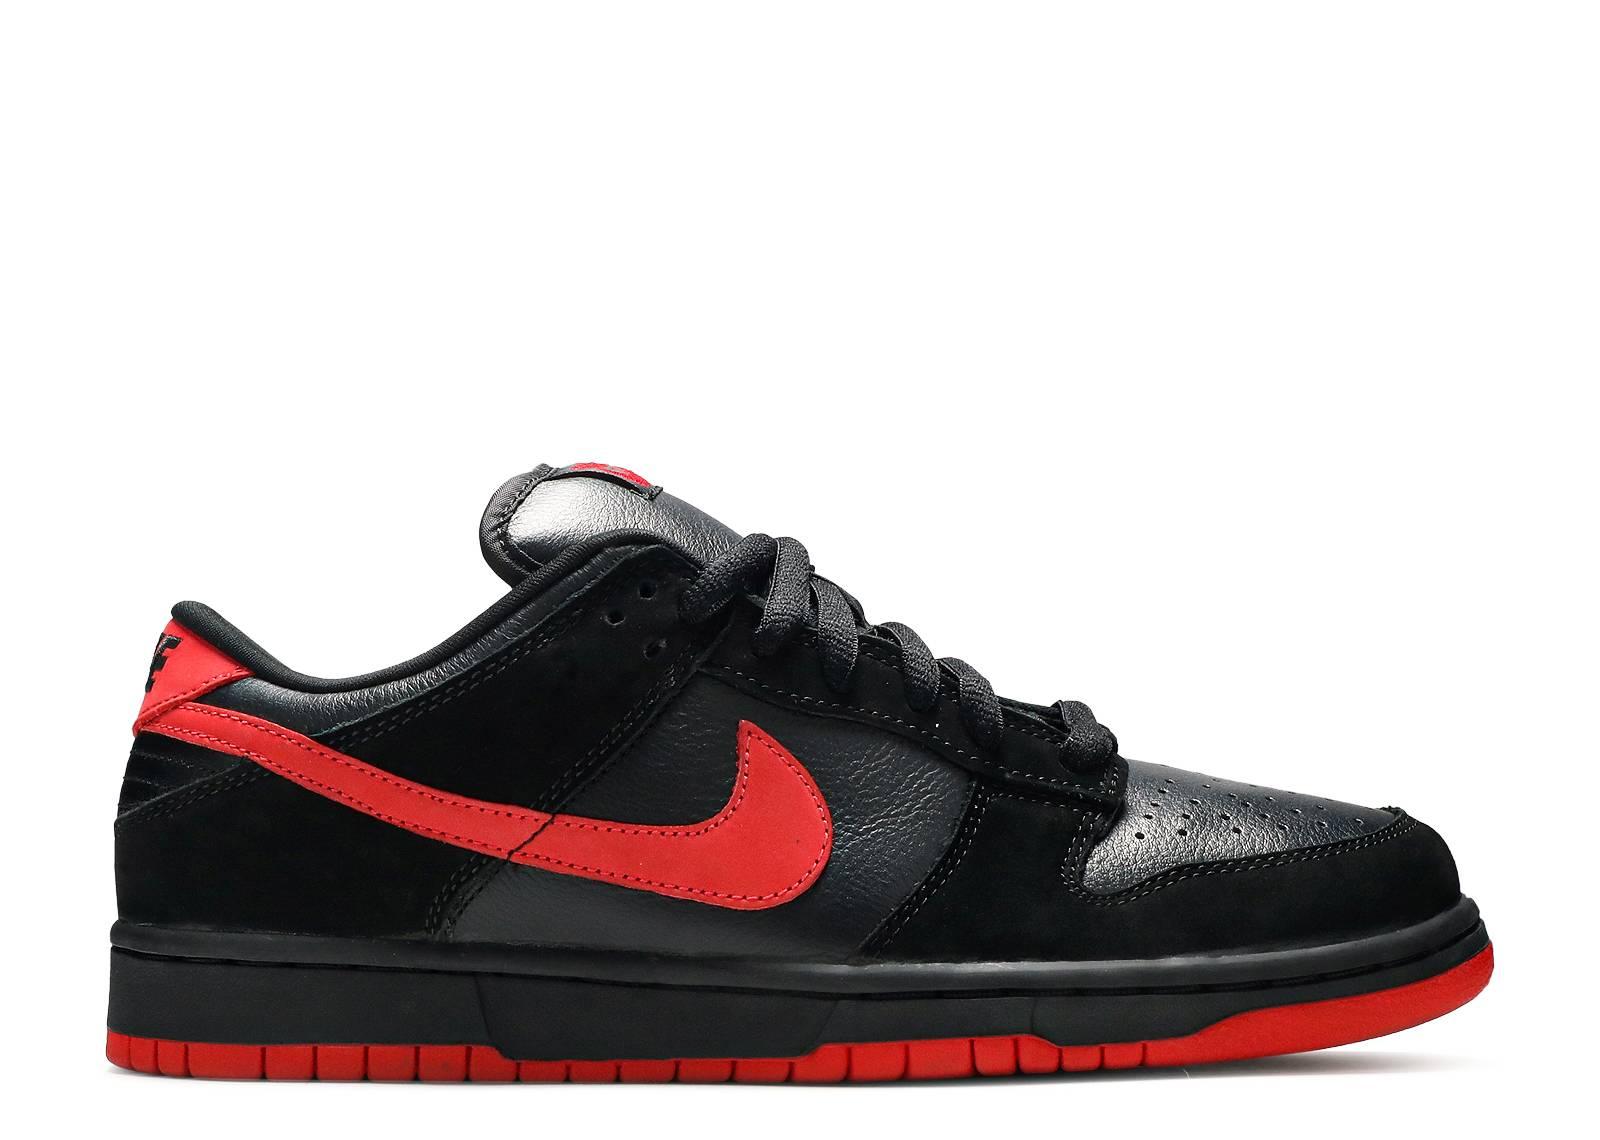 new product da0c9 3babc Dunk Low Pro Sb - Nike - 304292 061 - blacktrue red  Flight